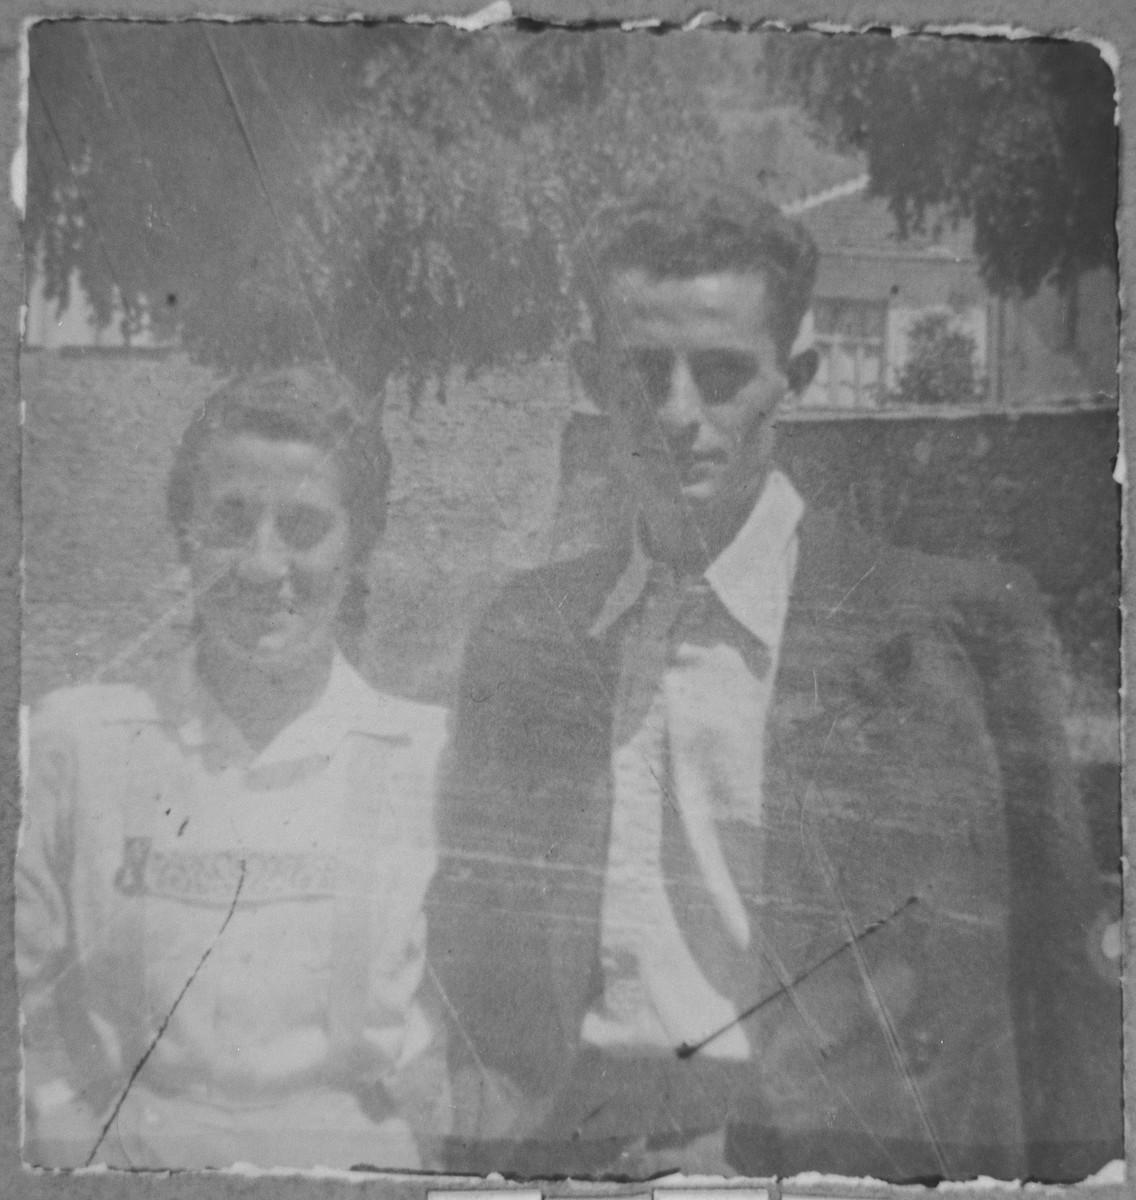 Portrait of Mois Faradji, son of Avram Faradji, and Shana Faradji, daughter of Avram Faradji.  They were students.  they lived at Karagoryeva 113 in Bitola.